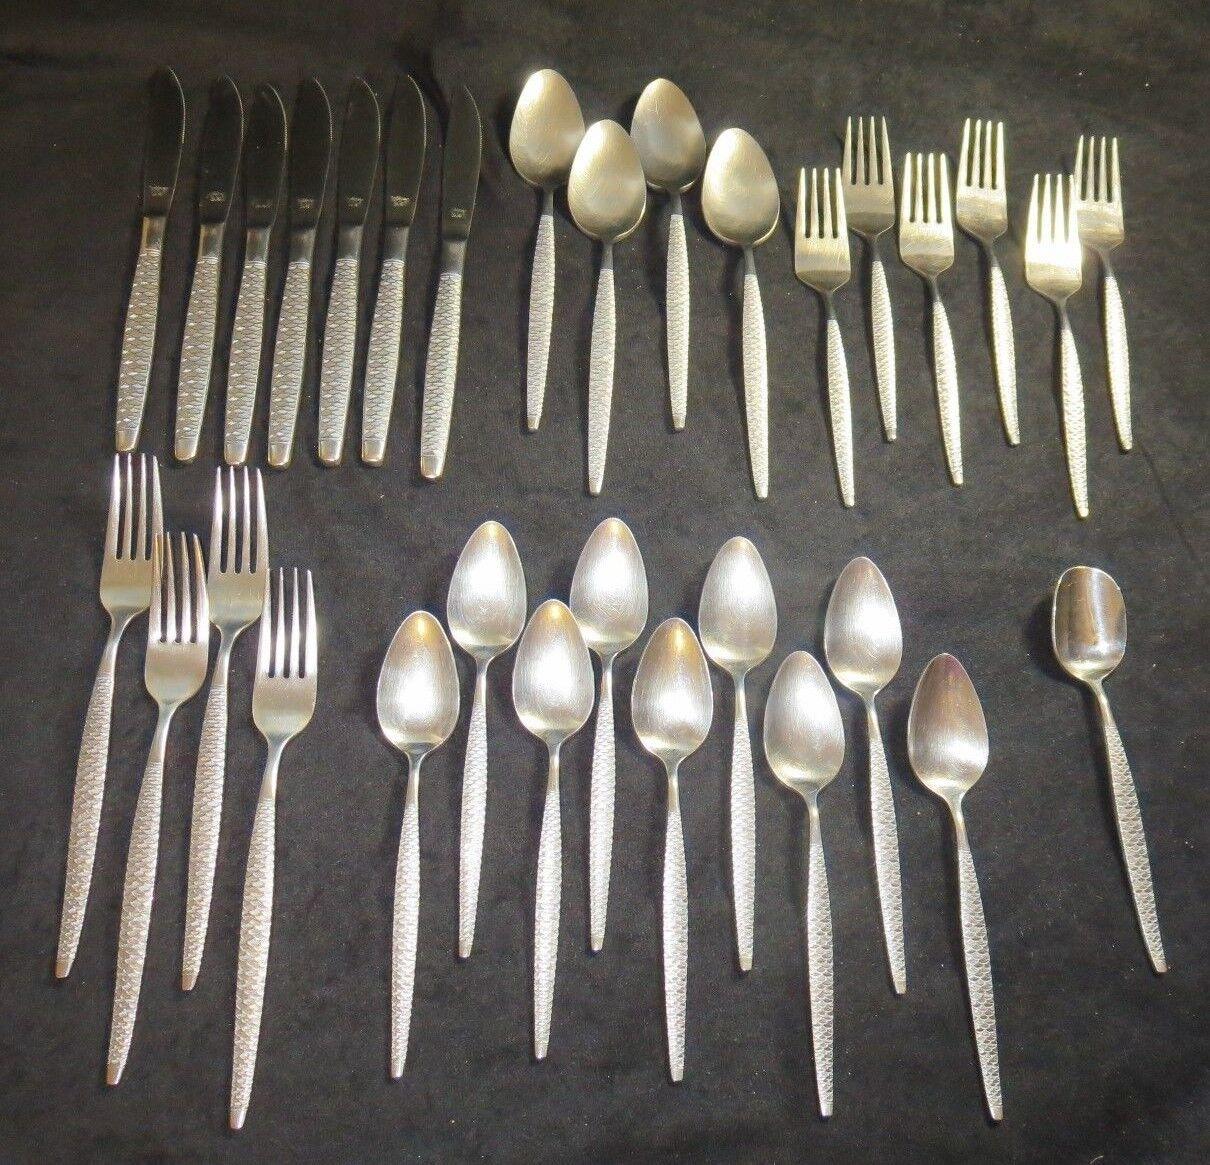 National stainless flatware La Concha Japan 31 pieces